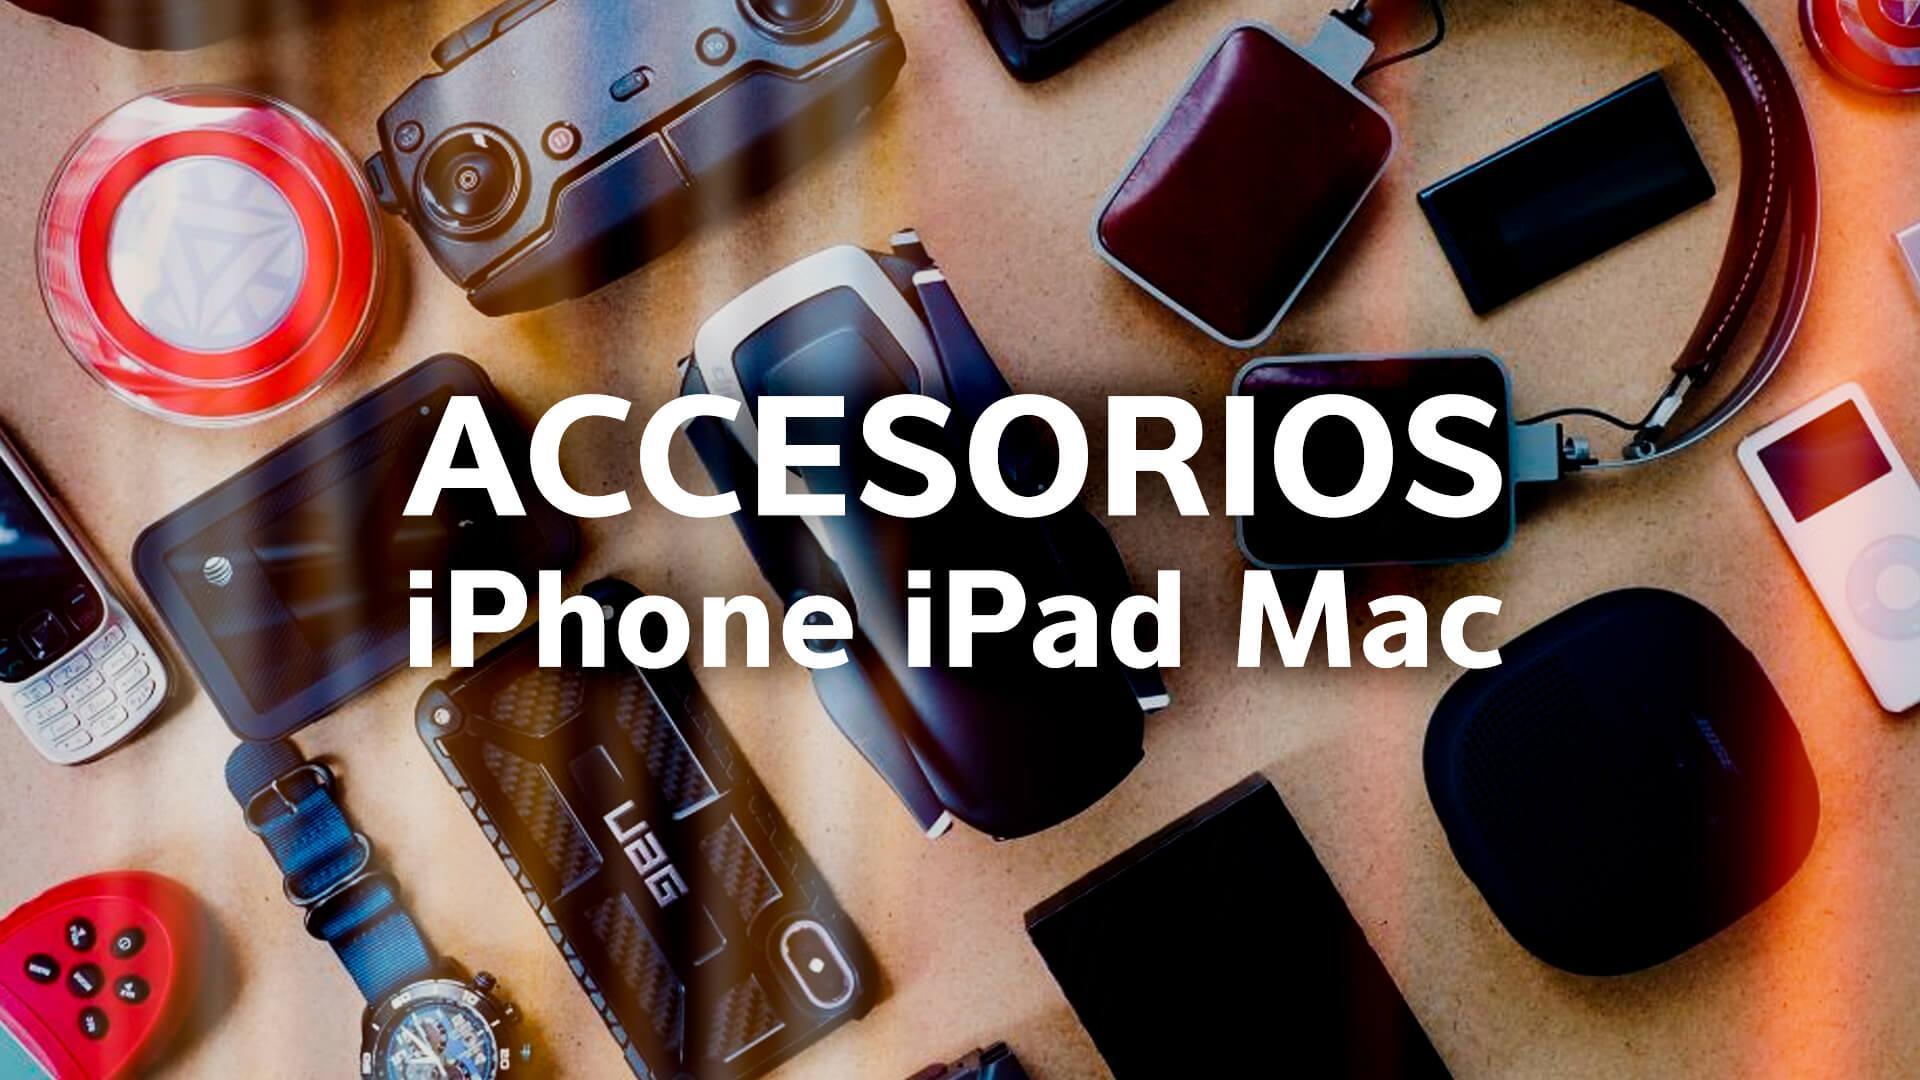 Cheap Accessories iPhone iPad Mac 2